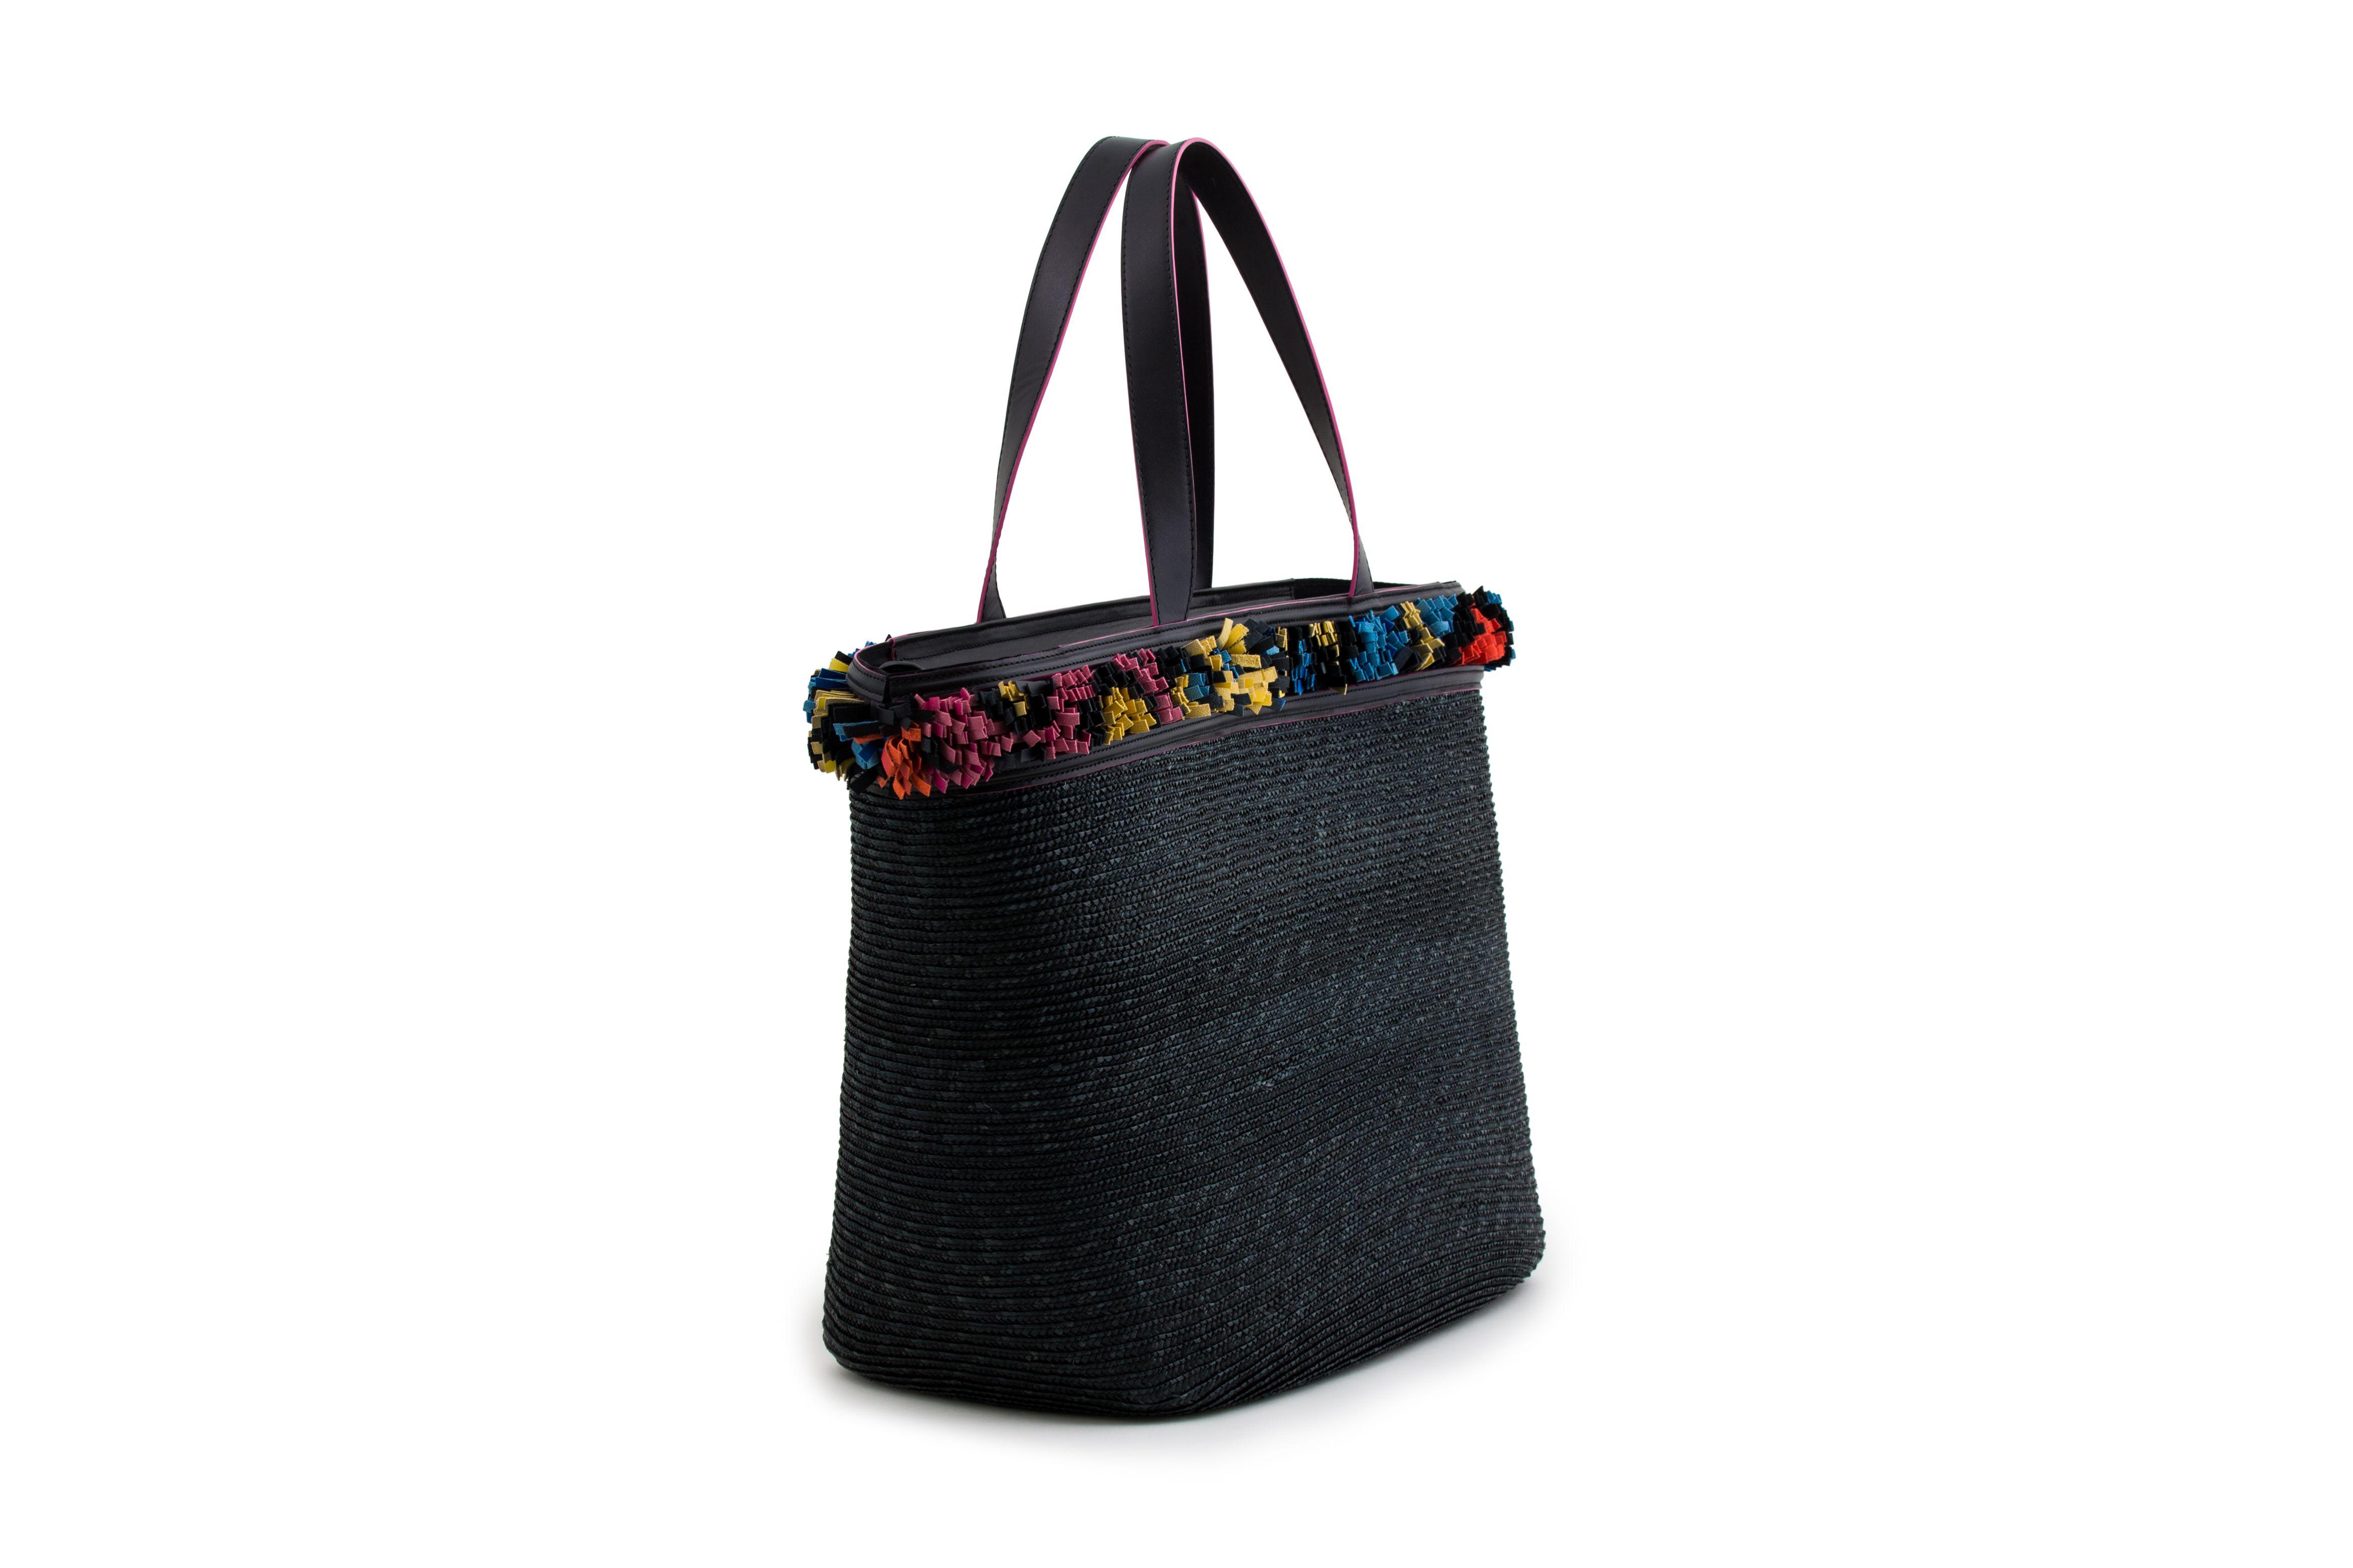 Small Leather Goods - Pouches Azzurra Gronchi RwucgRu